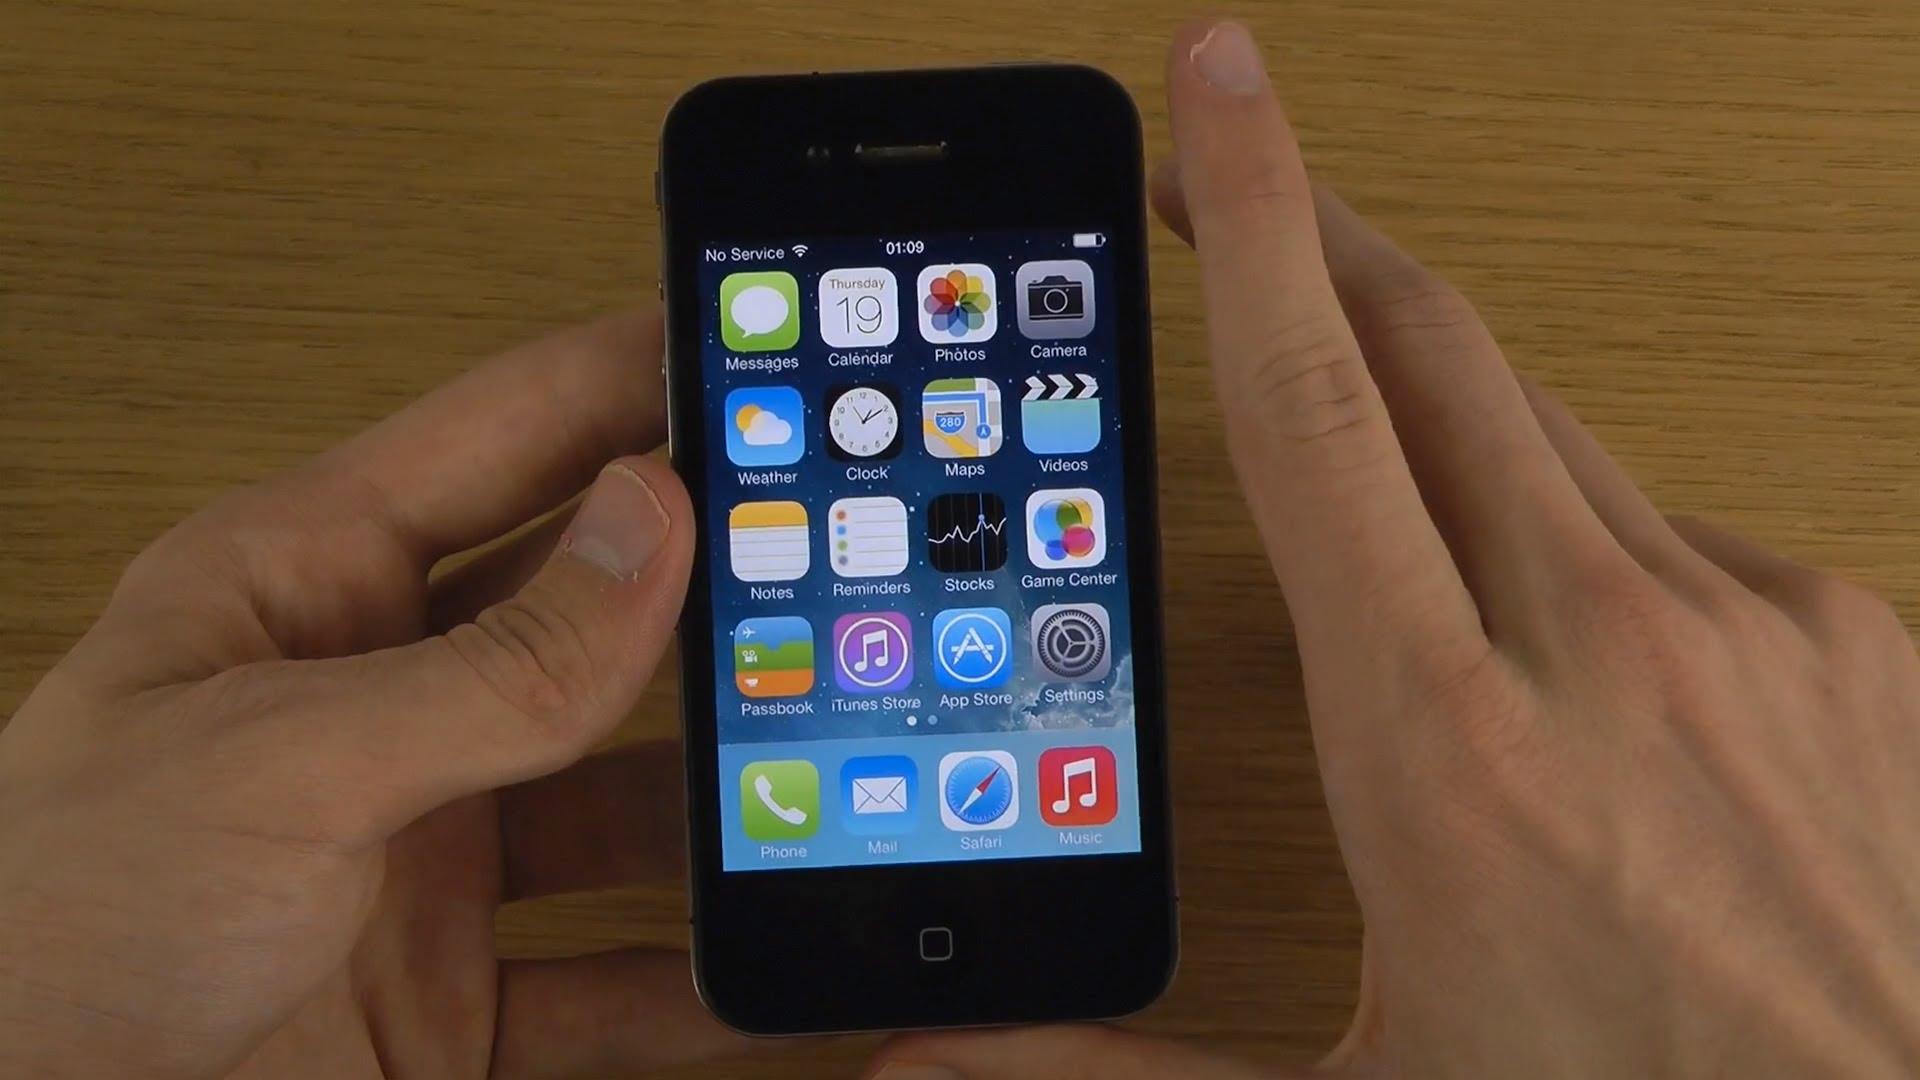 Comment debloquer un iphone 4 ?